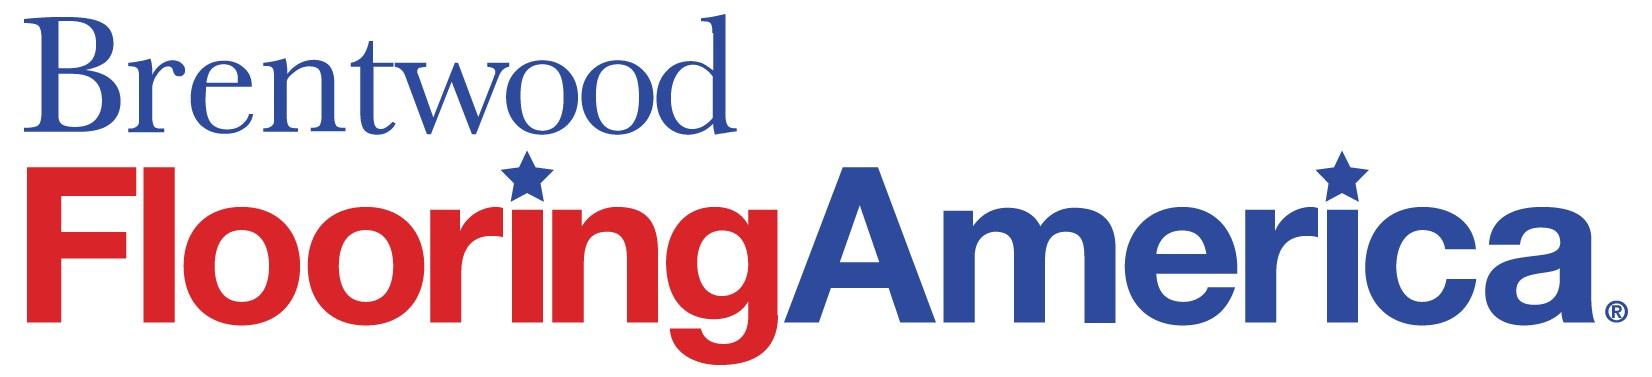 brentwood-flooring-america-logo- news.jpg